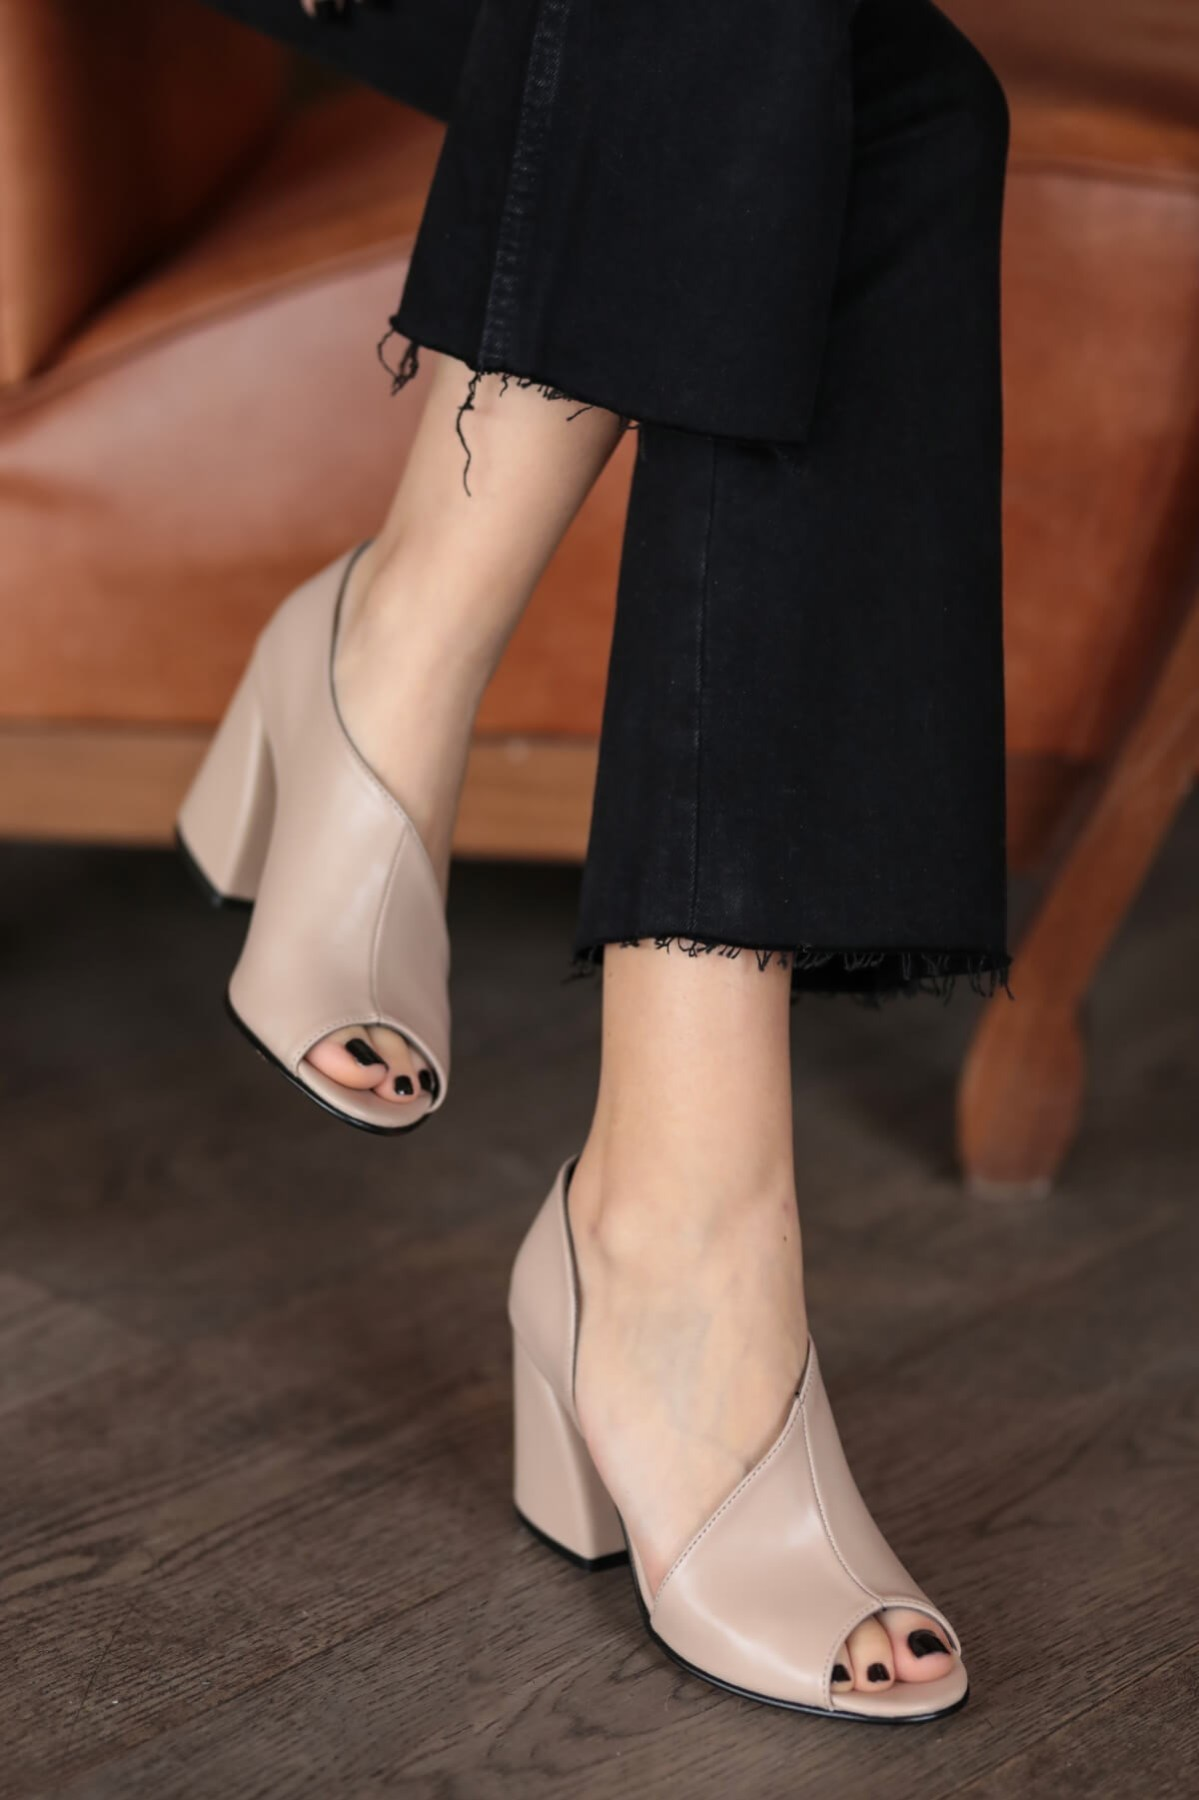 Eva Tan Black Colour Heels Shoes High Heel Shoes Office Lady Wedding Casual Square Heel Classic 2020 New Fashion